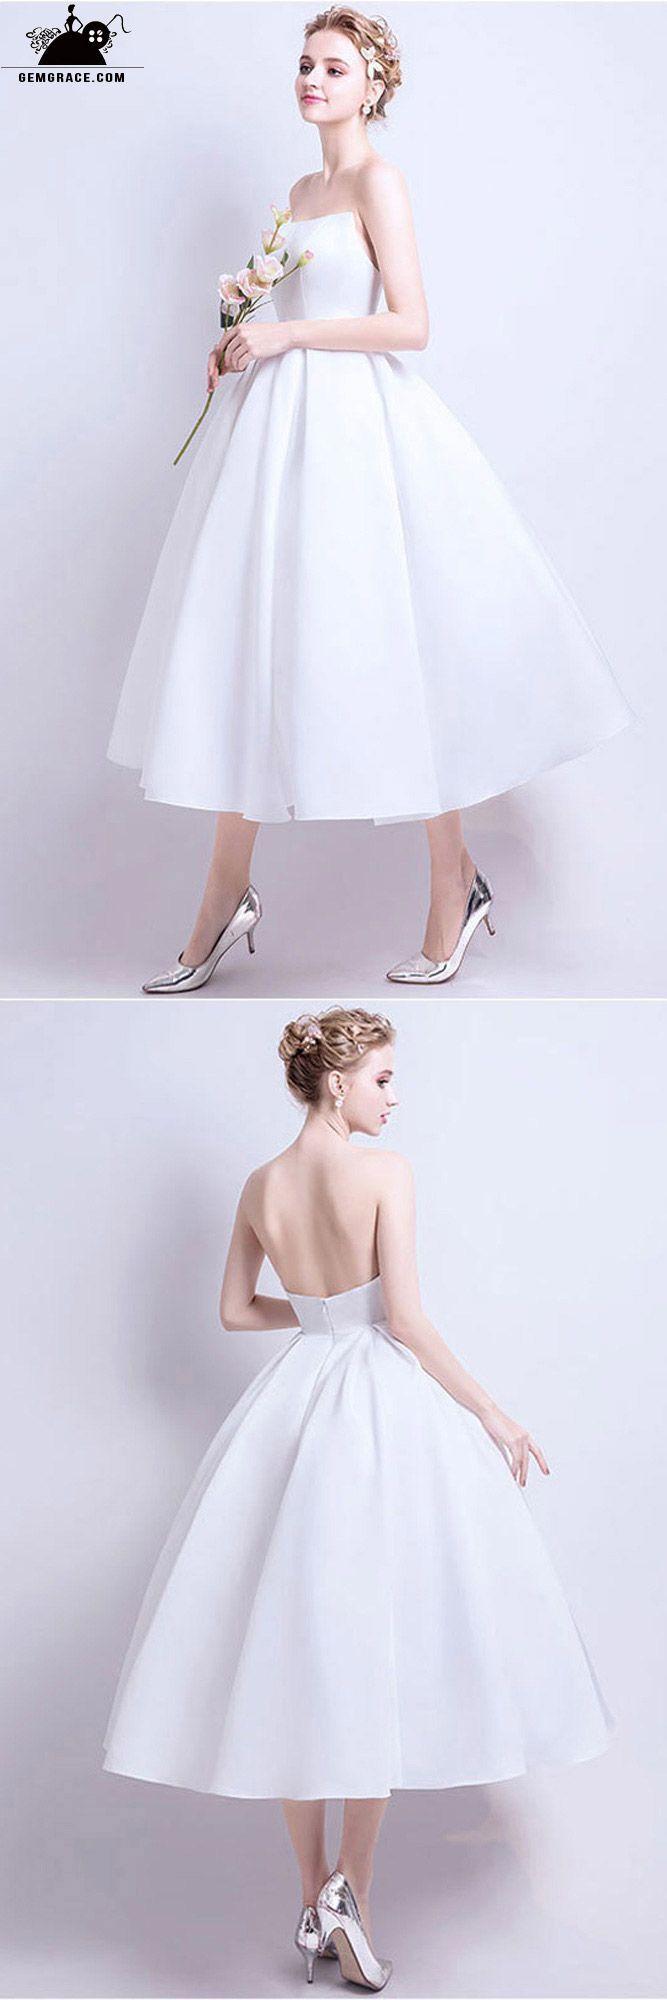 Short Ballgown White Wedding Dress Tea Length Short Wedding Dress Simple Wedding Dress Short Short Bridal Dress [ 2000 x 667 Pixel ]